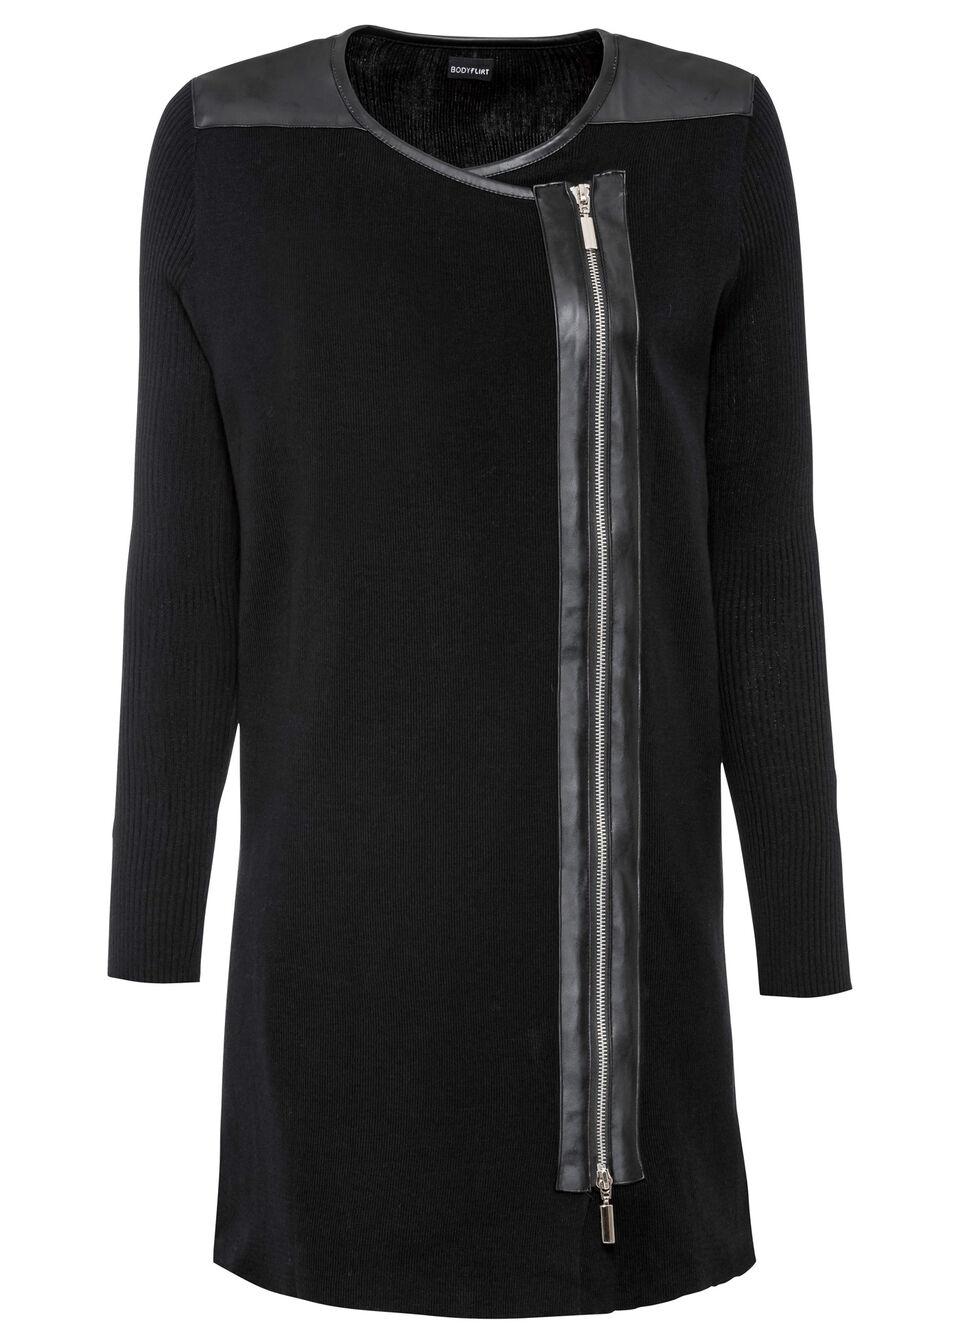 Dlhý pletený sveter so zipsom bonprix